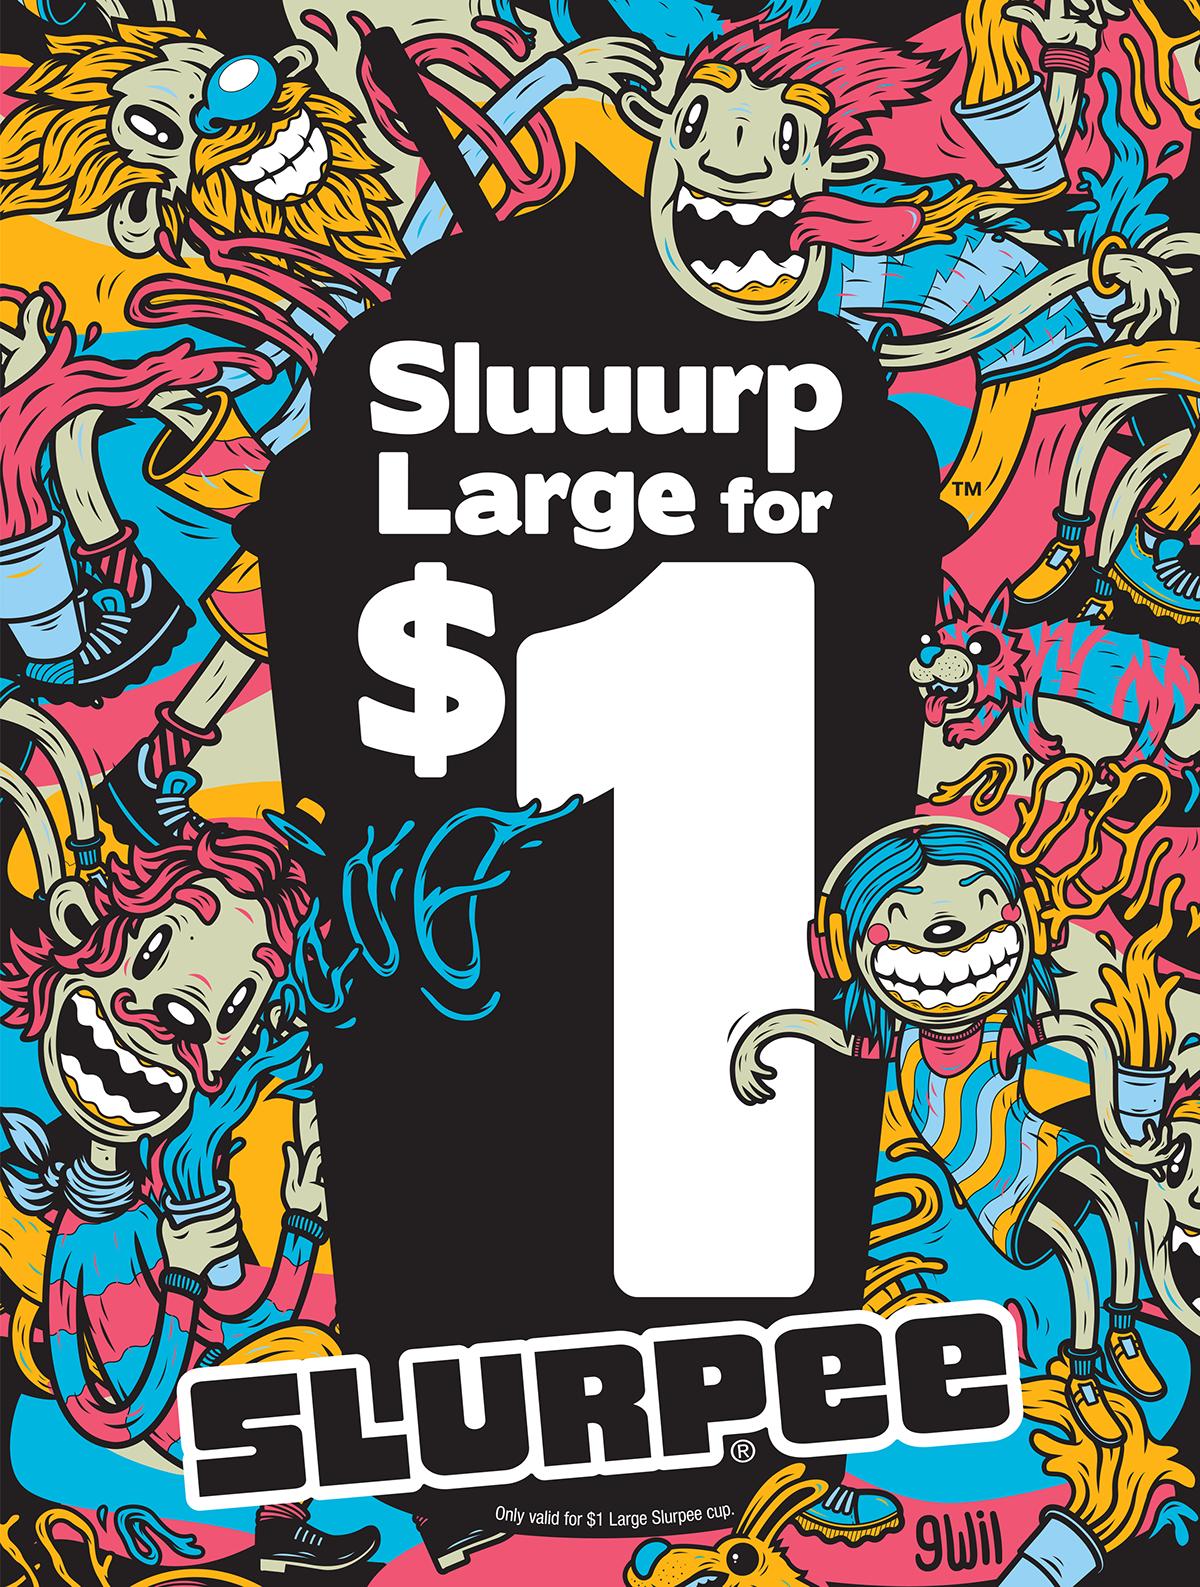 gwil   SLURPEE 7-Eleven cup